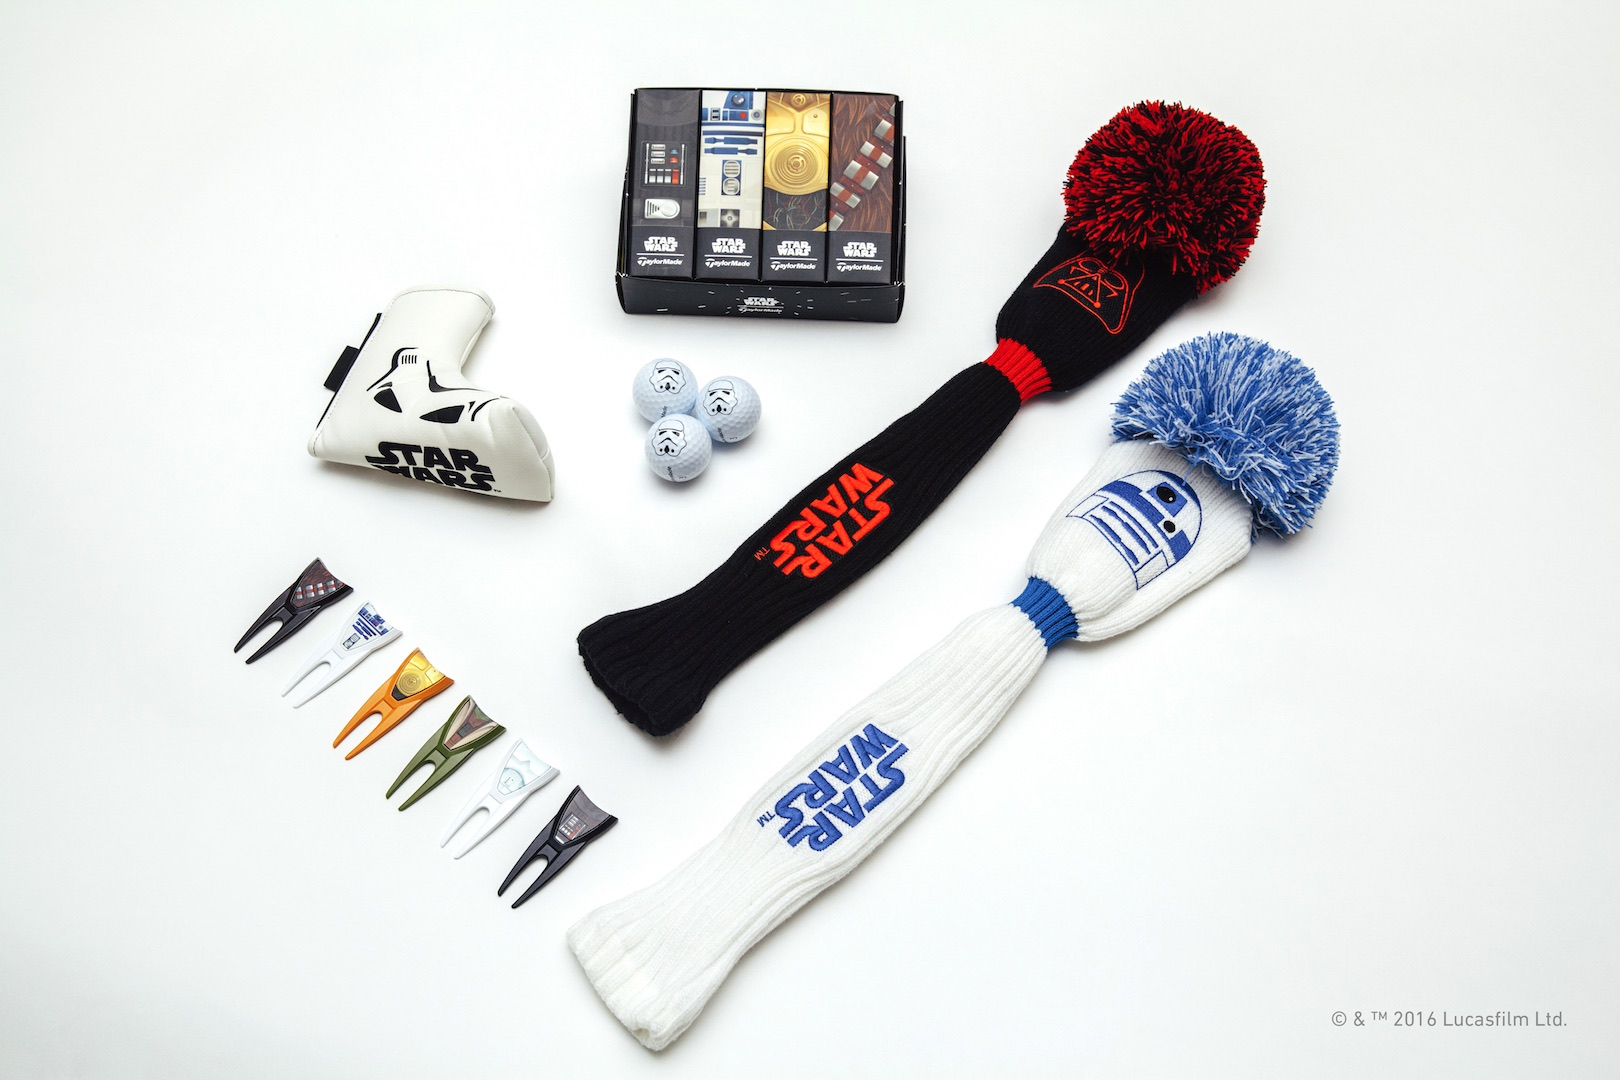 TaylorMade launch Star Wars golf gear